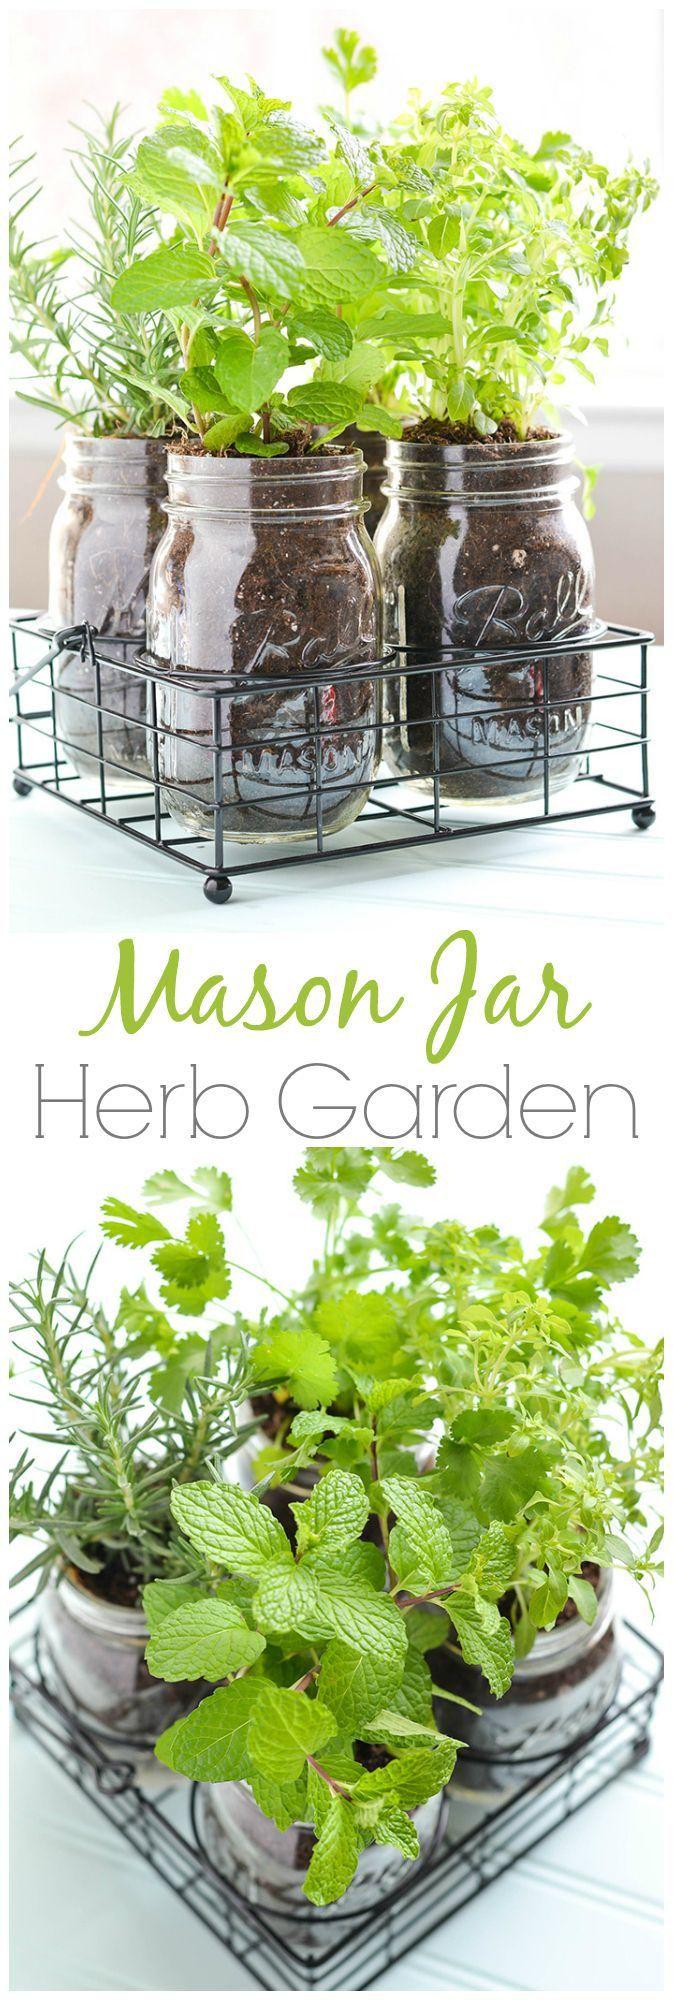 Mason Jar DIY Herb Garden - #gardens #gardening #garden #landscaping #diy http://gardeningjoys.xyz/mason-jar-diy-herb-garden/…